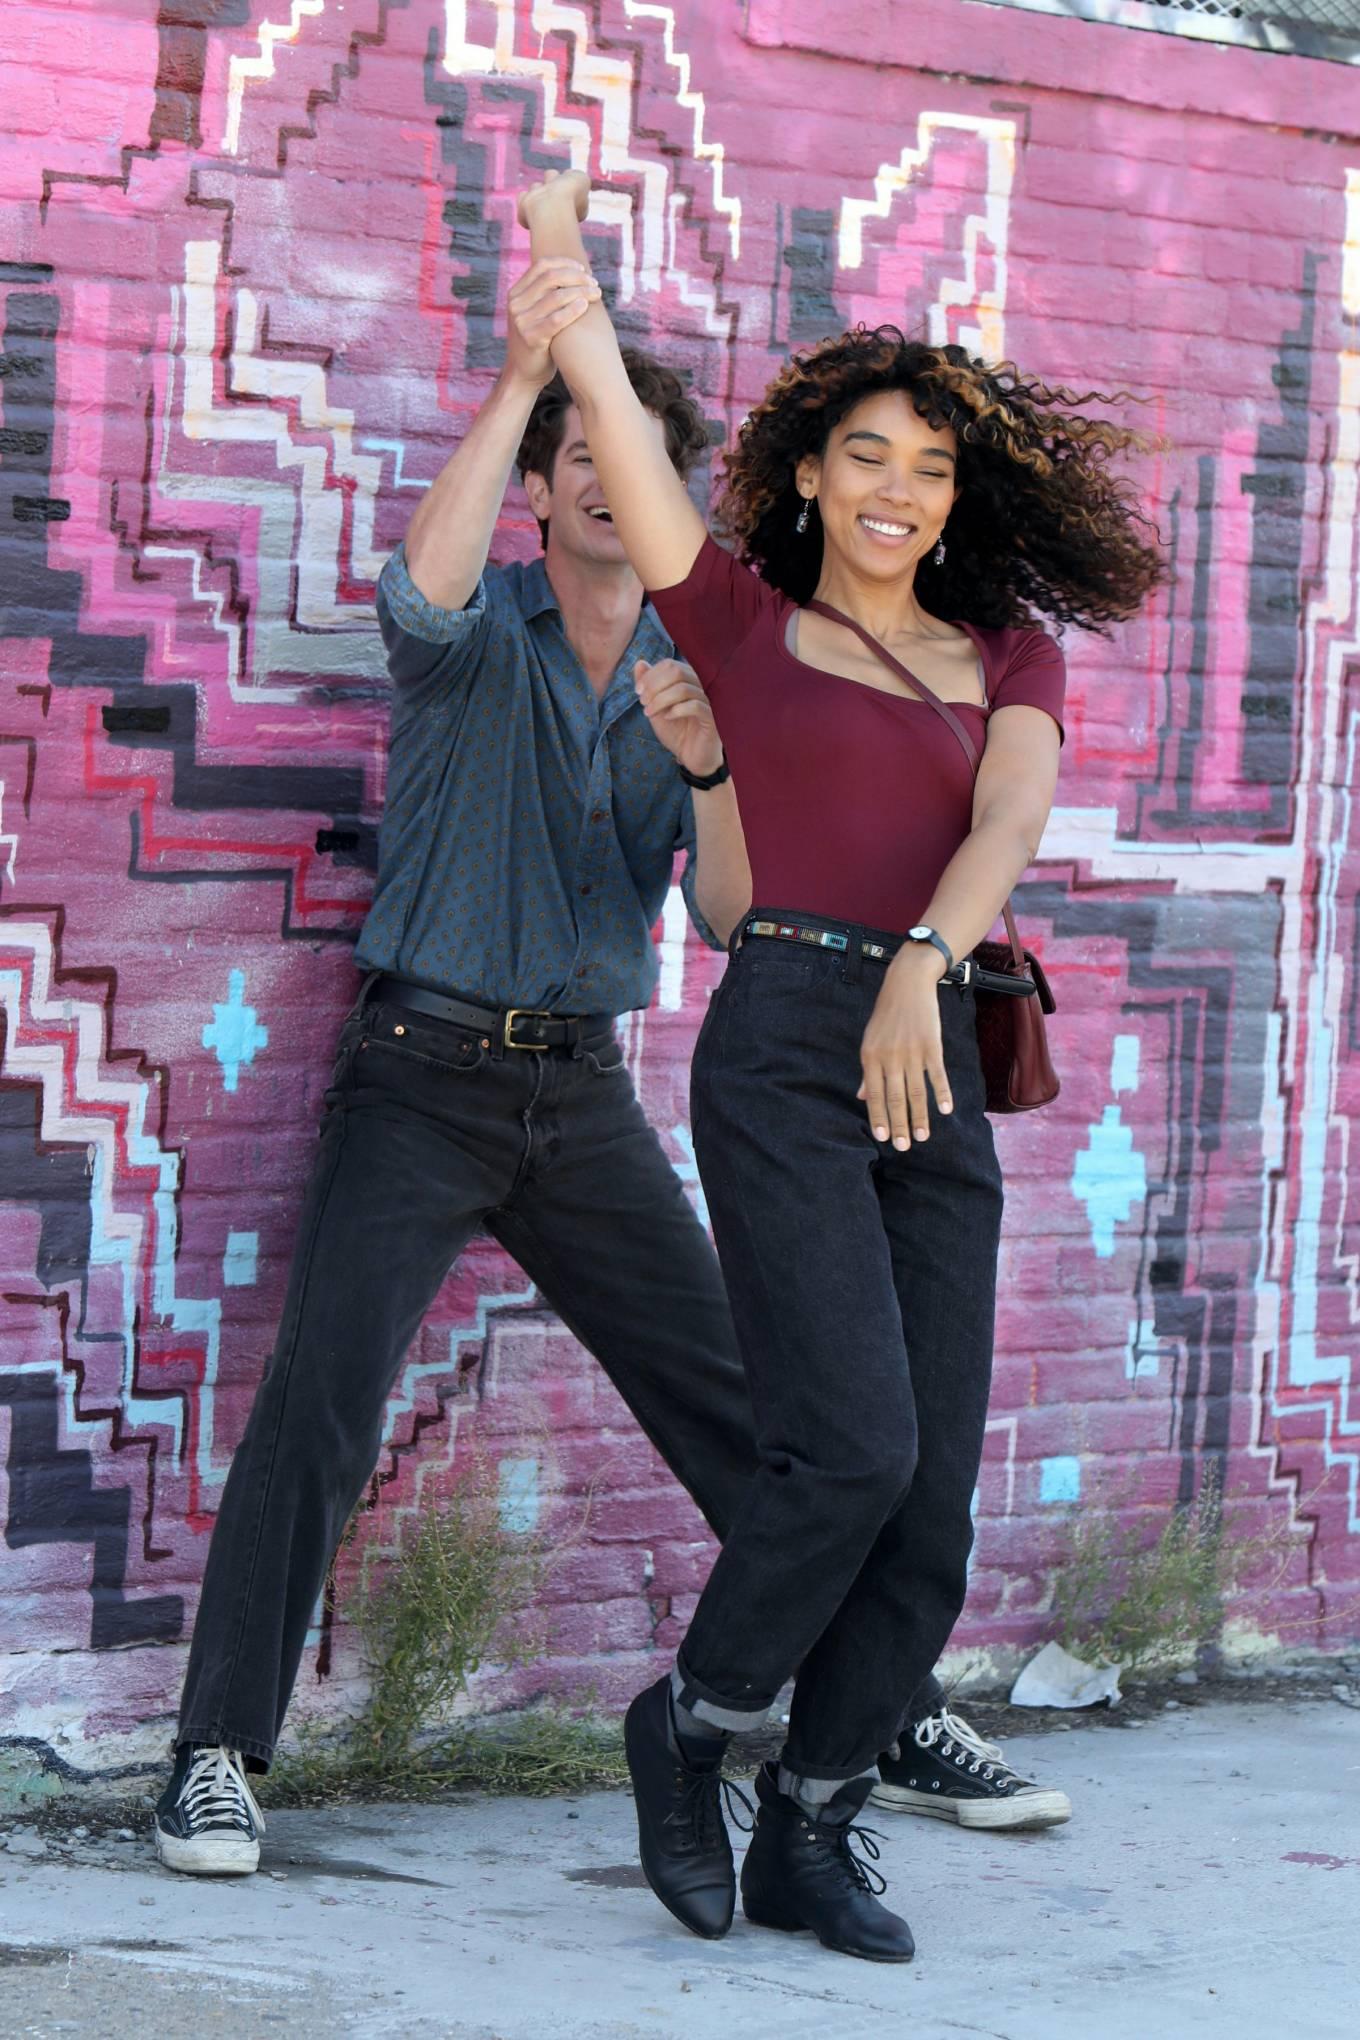 Alexandra Shipp - With Andrew Garfield - Filming 'Tick, Tick... Boom' in New York